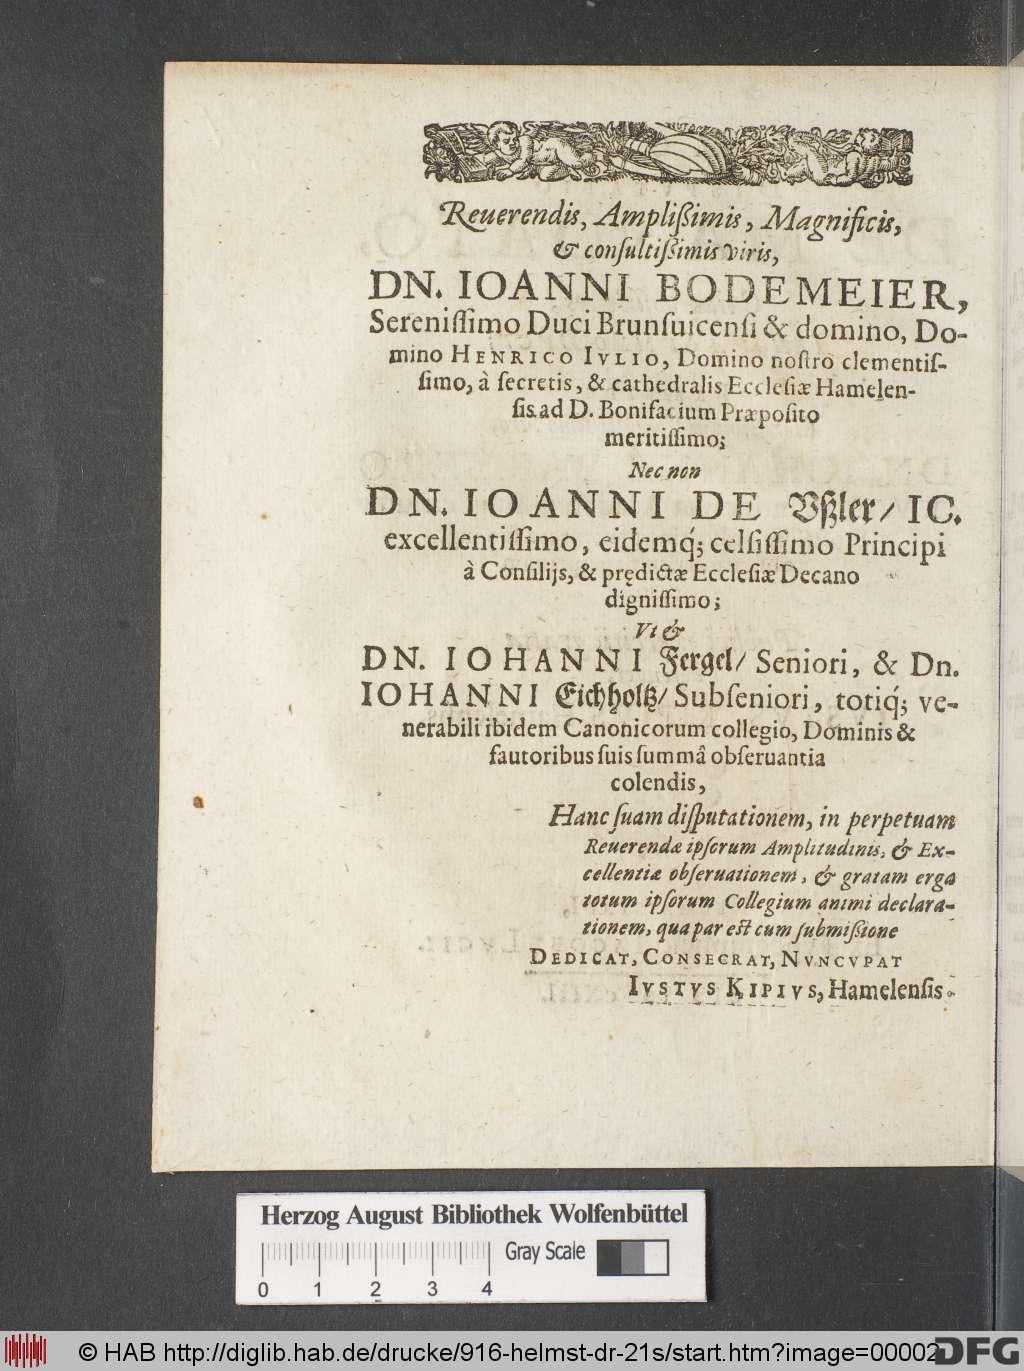 https://diglib.hab.de/drucke/916-helmst-dr-21s/00002.jpg